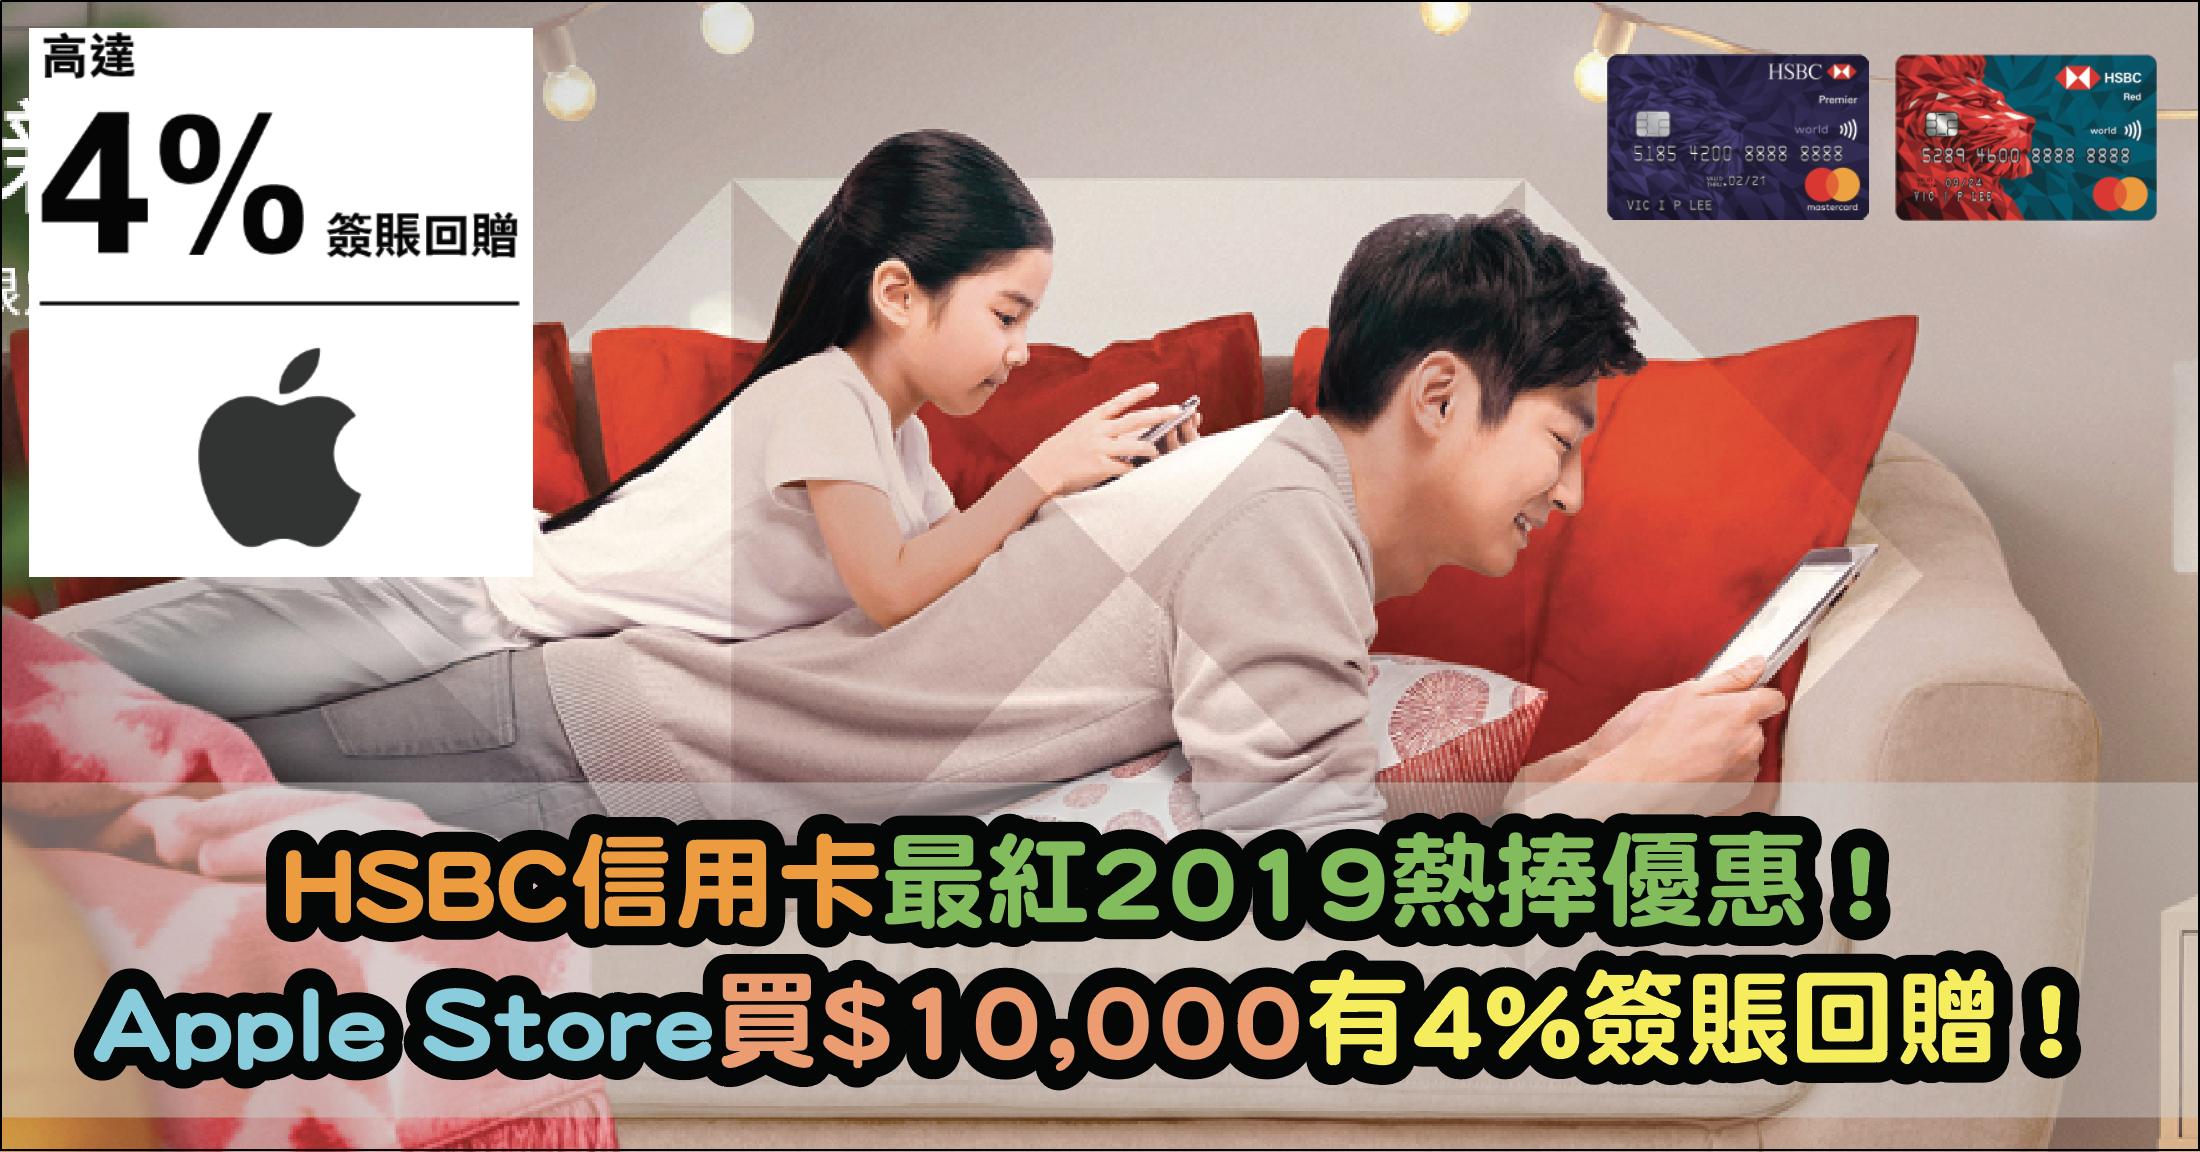 HSBC最紅2019熱捧優惠!HSBC Mastercard Apple Store 買$10,000有4%簽賬回贈!再加埋HSBC Red Card 網上4%前後有8%!